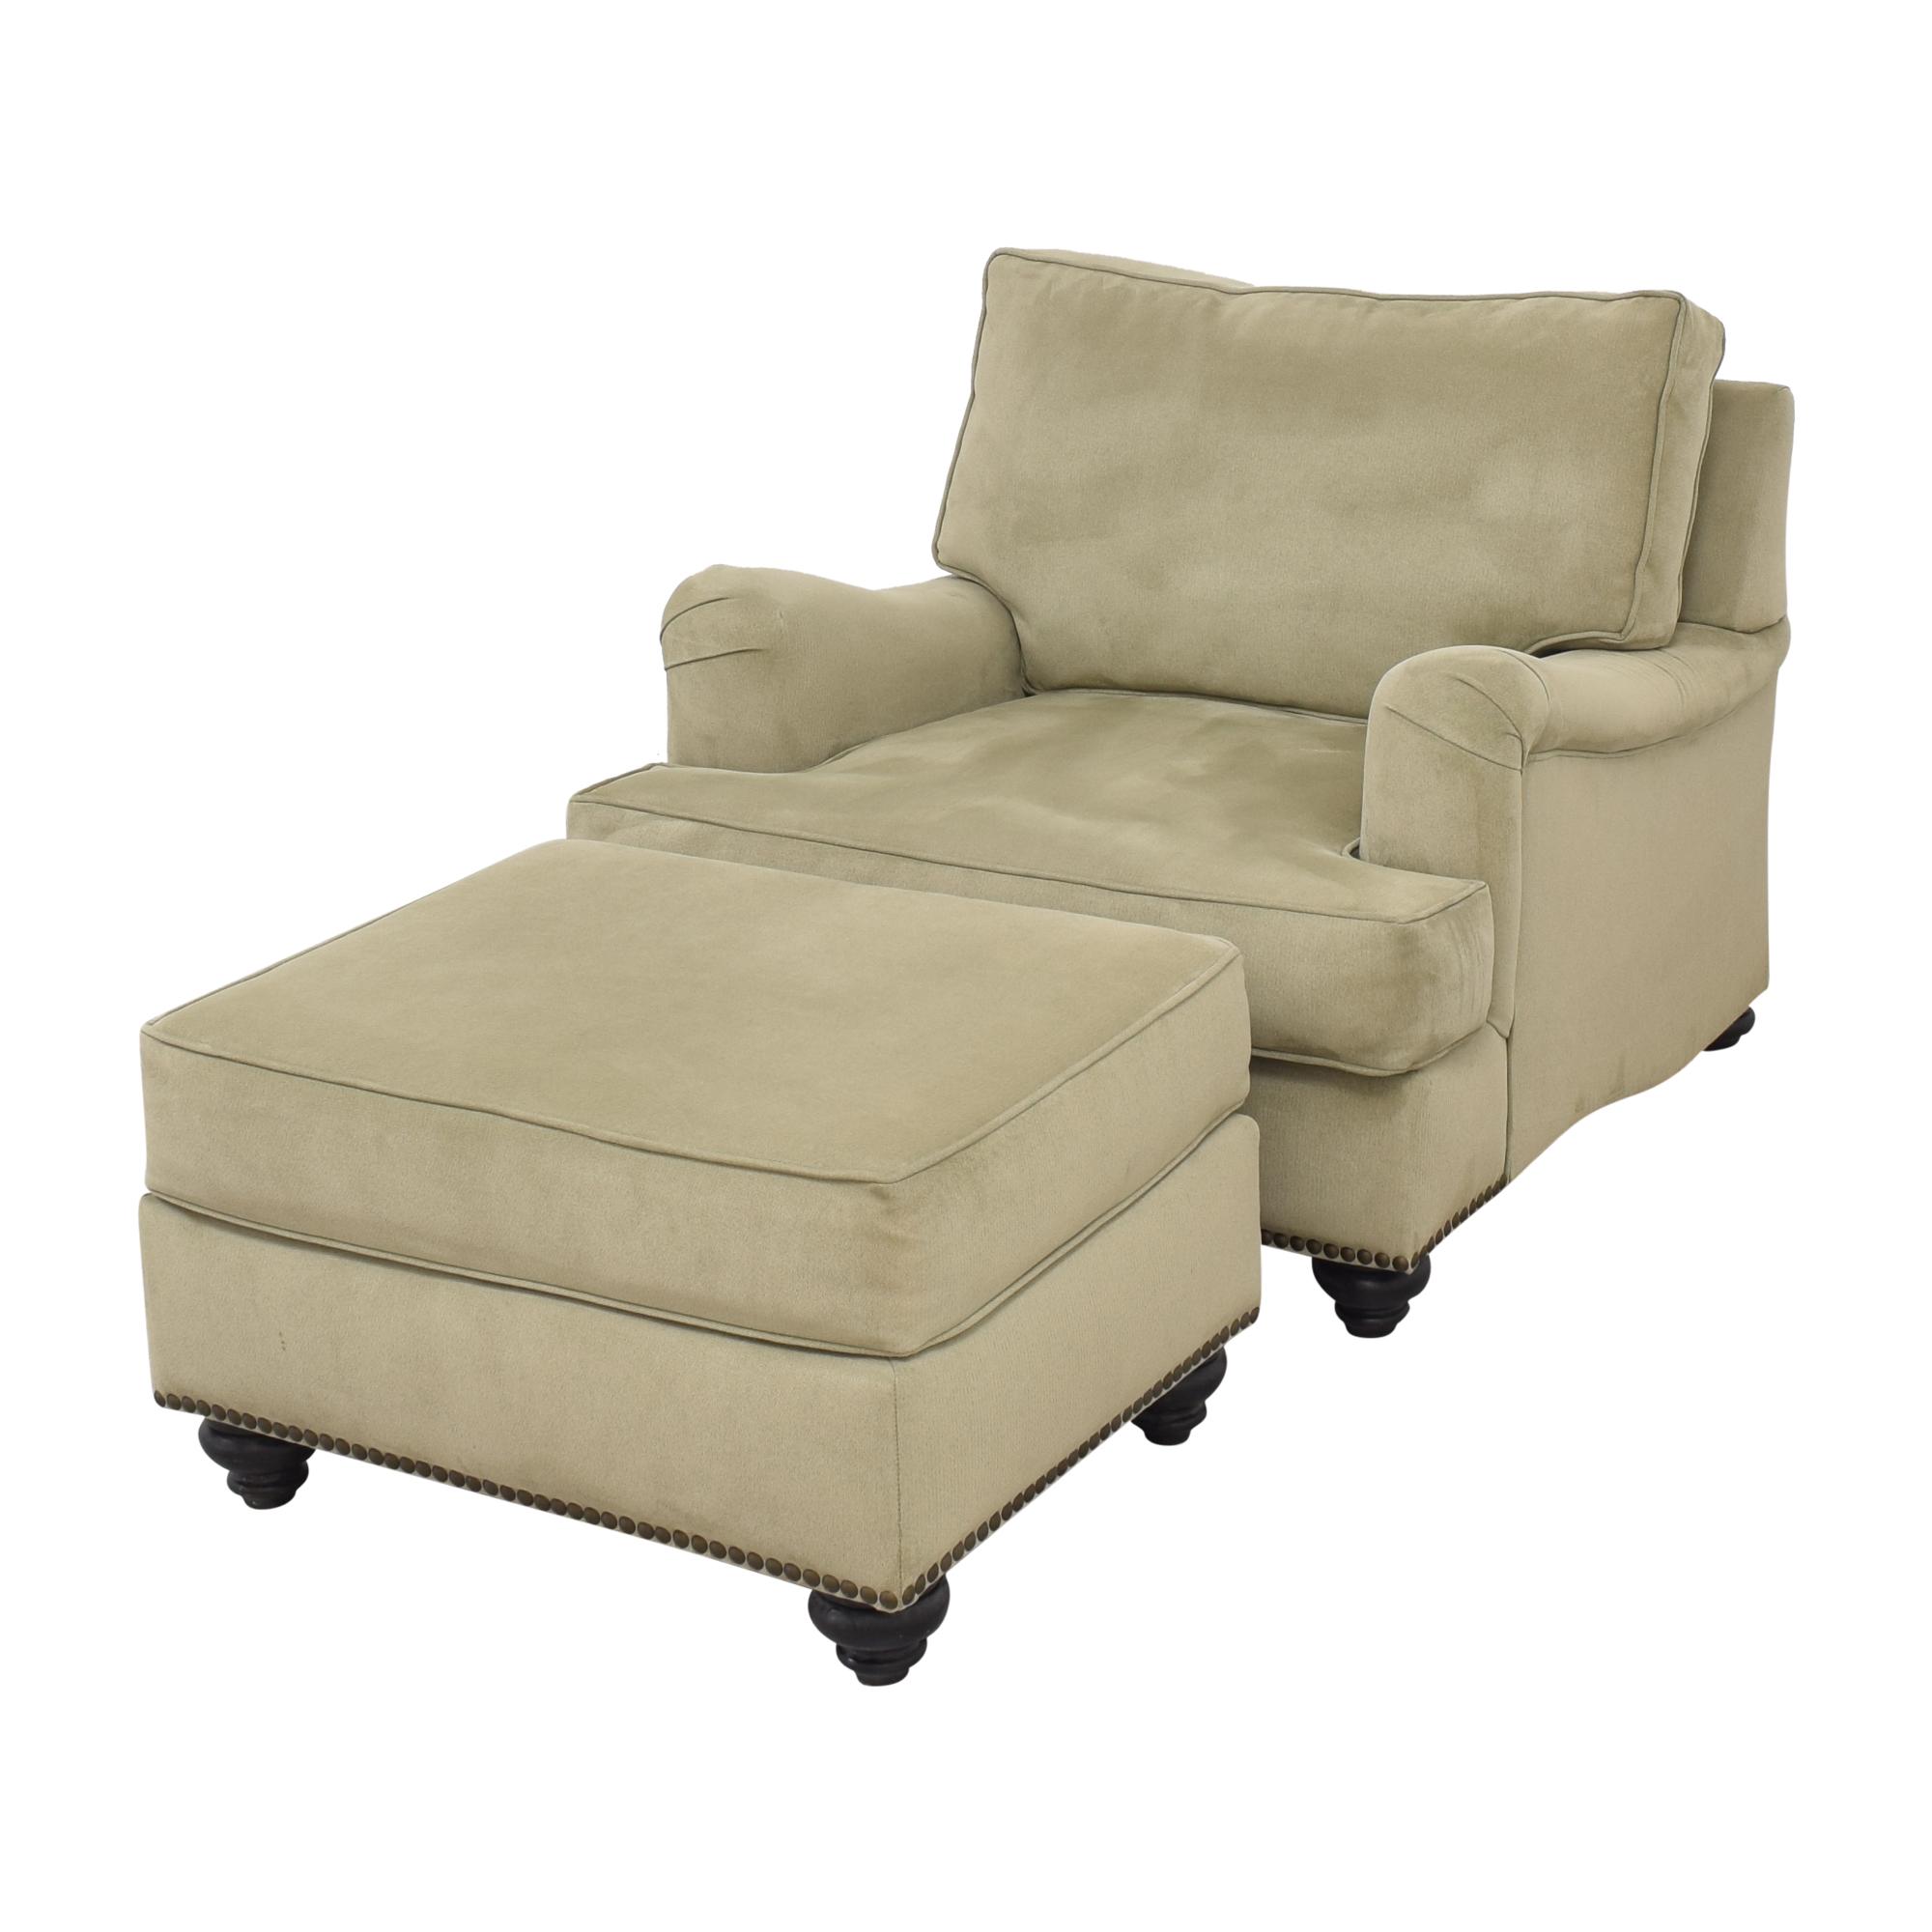 shop Nailhead Accent Chair with Ottoman